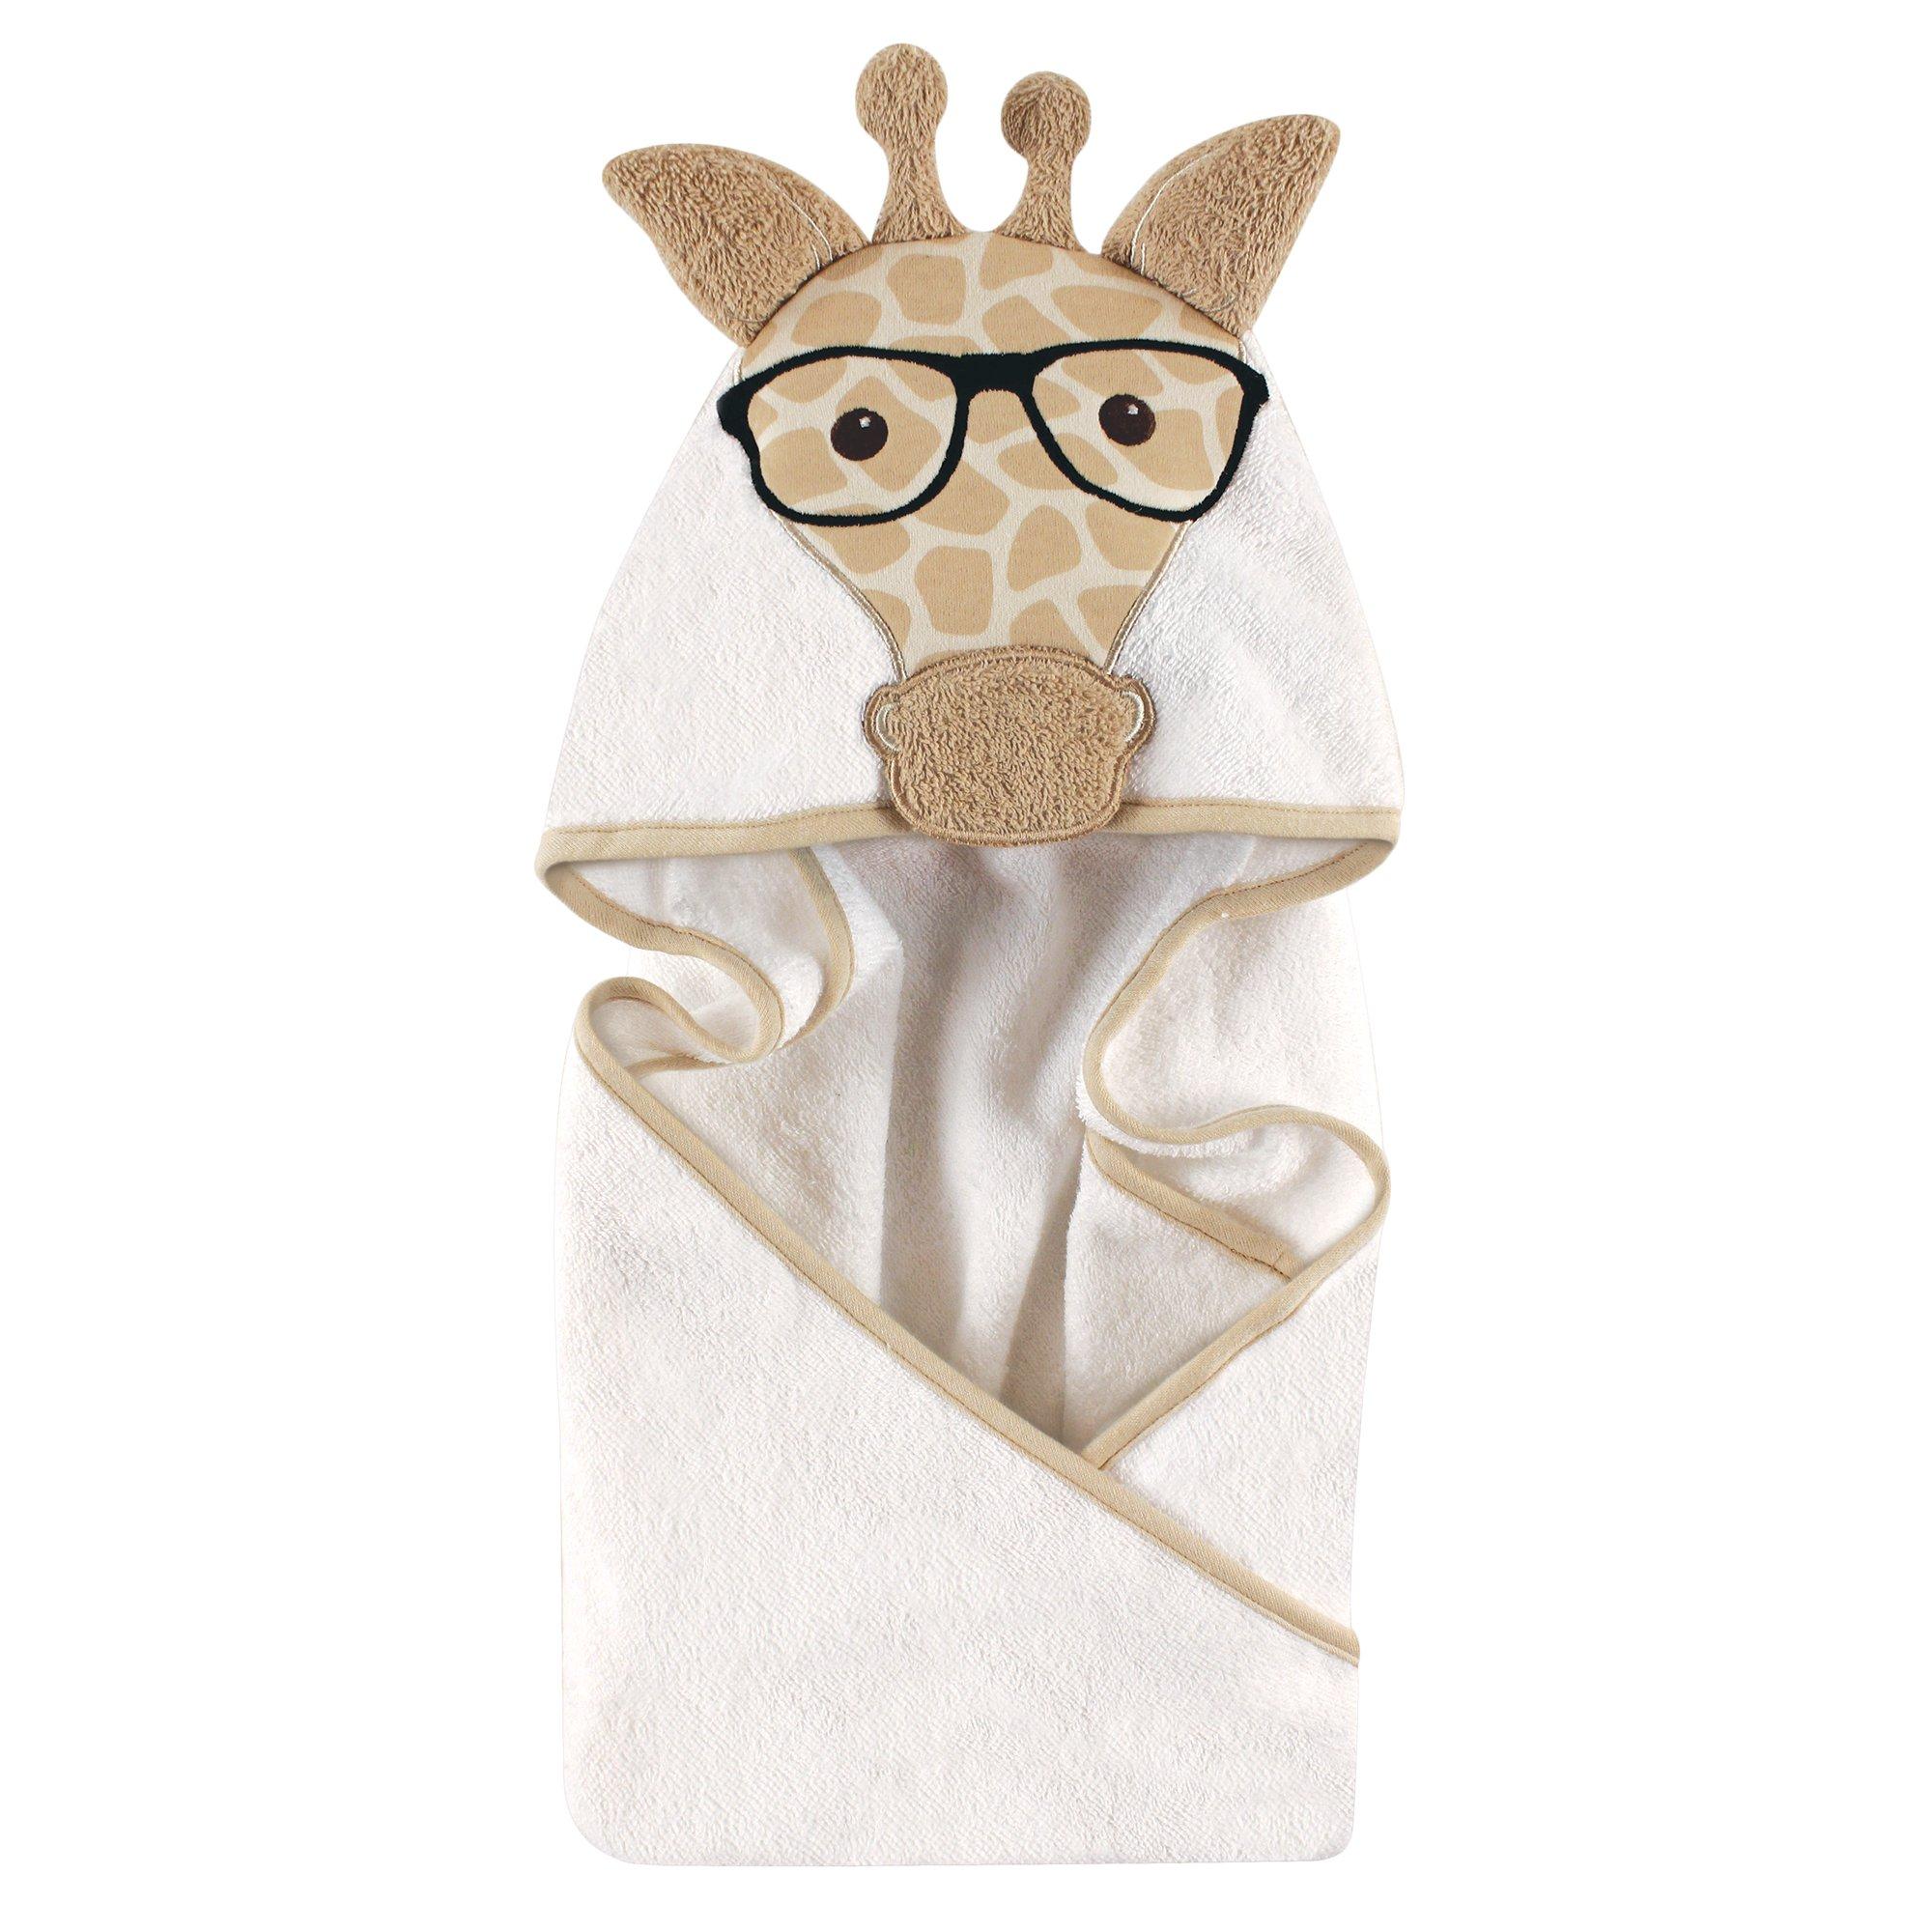 Hudson Baby Animal Face Hooded Towel, Nerdy Giraffe